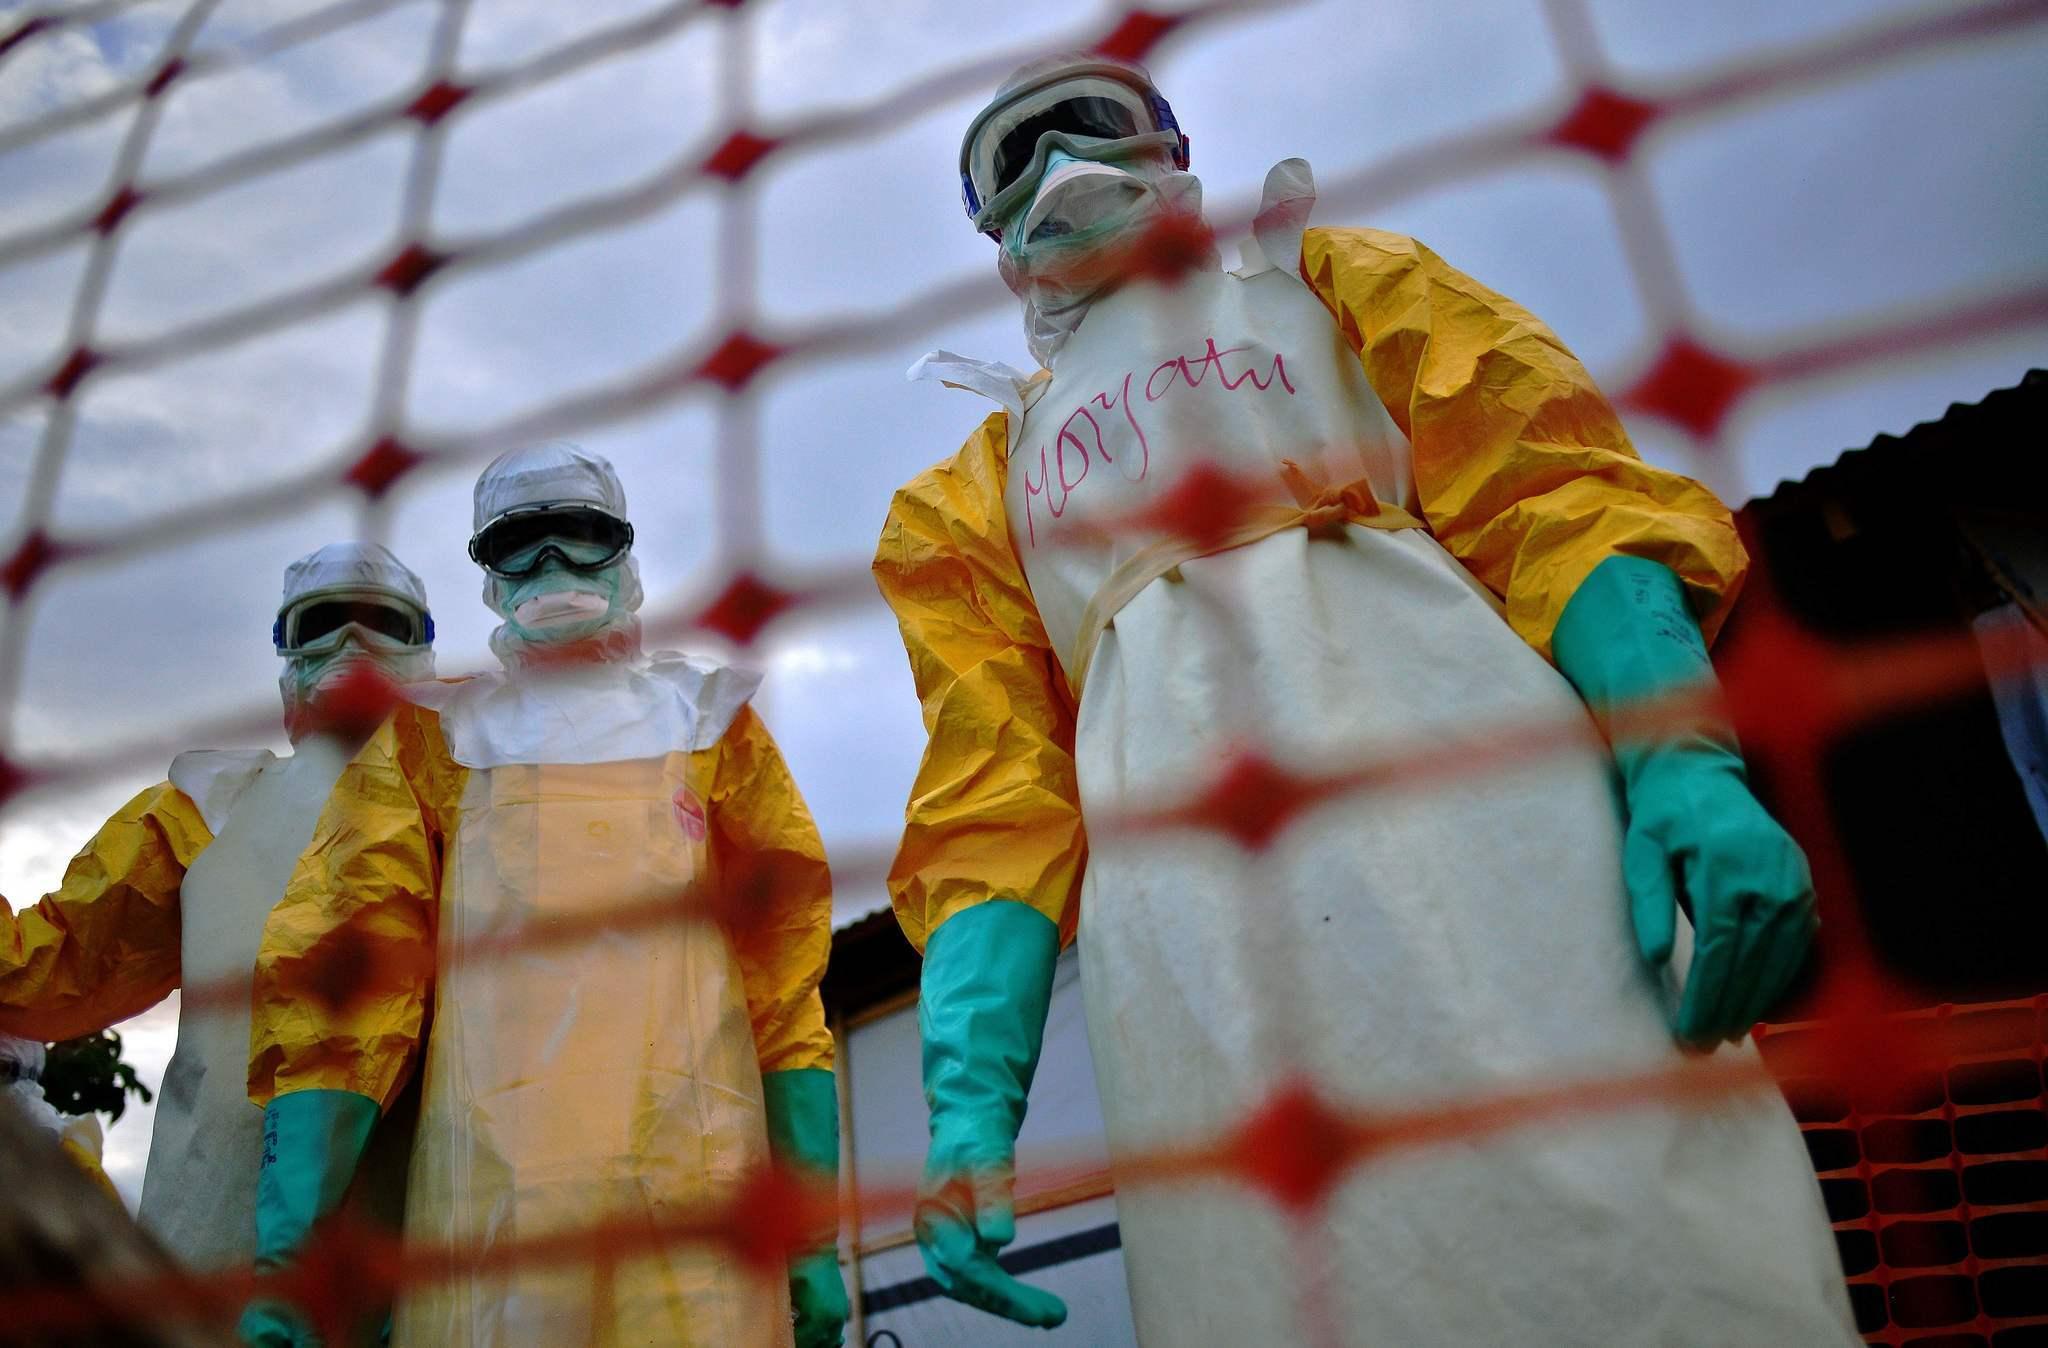 U.S. ramps up Ebola response using military